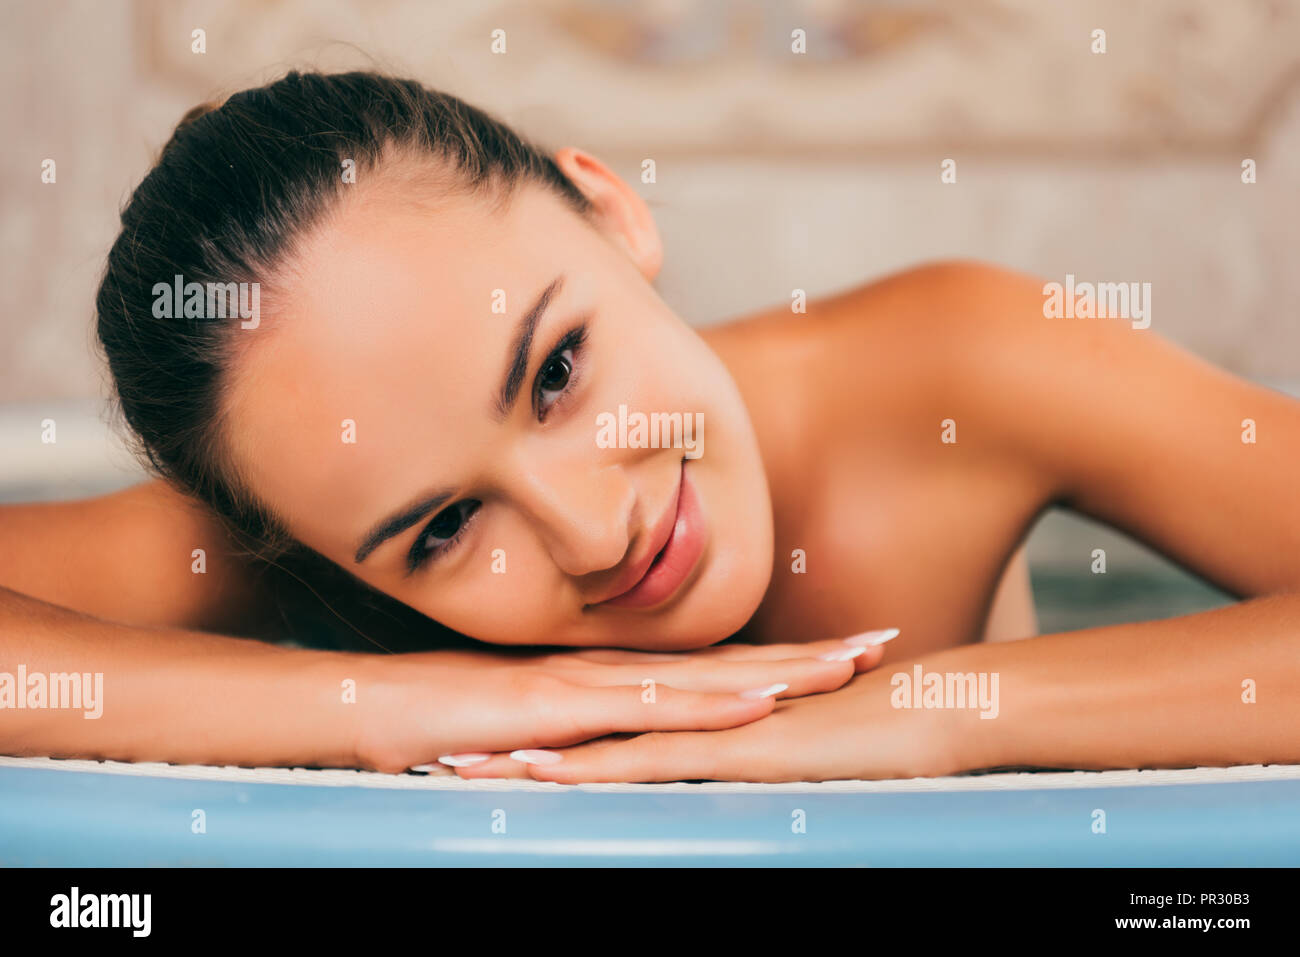 young woman resting at salon and looking at camera - Stock Image